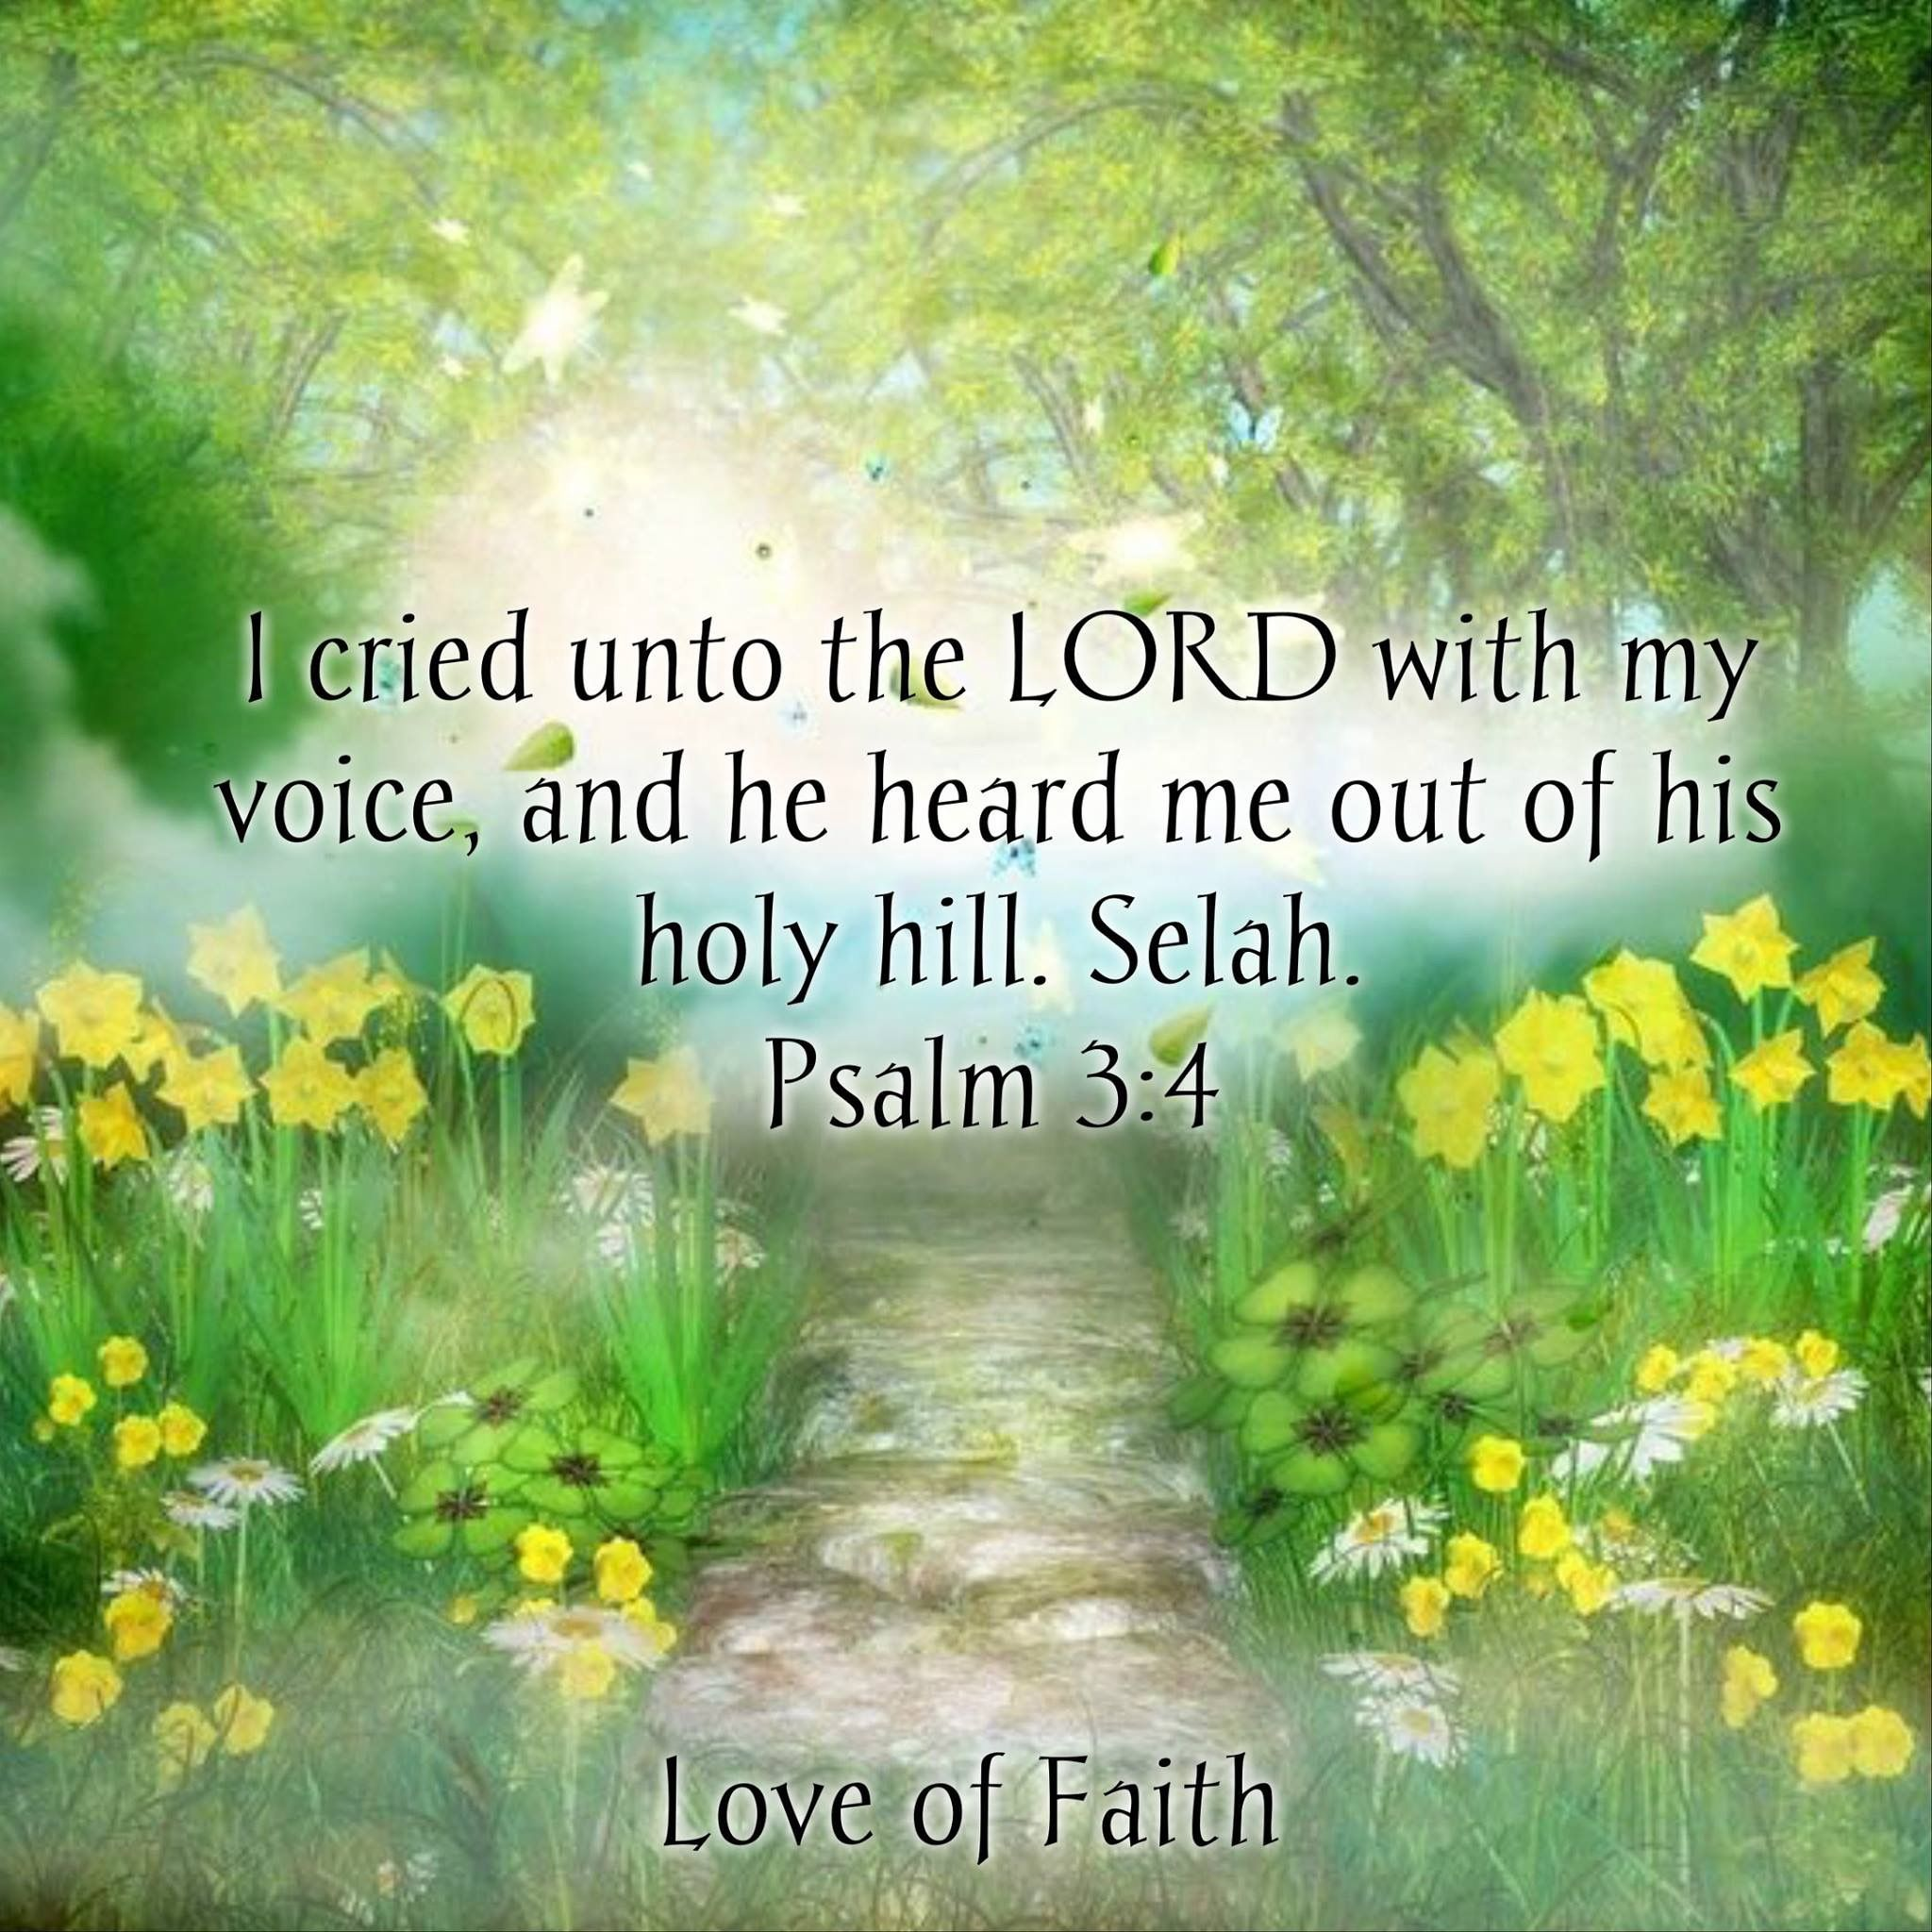 Pin by Lisa Neufeld on psalm | Bible verses, Word of god, Bible